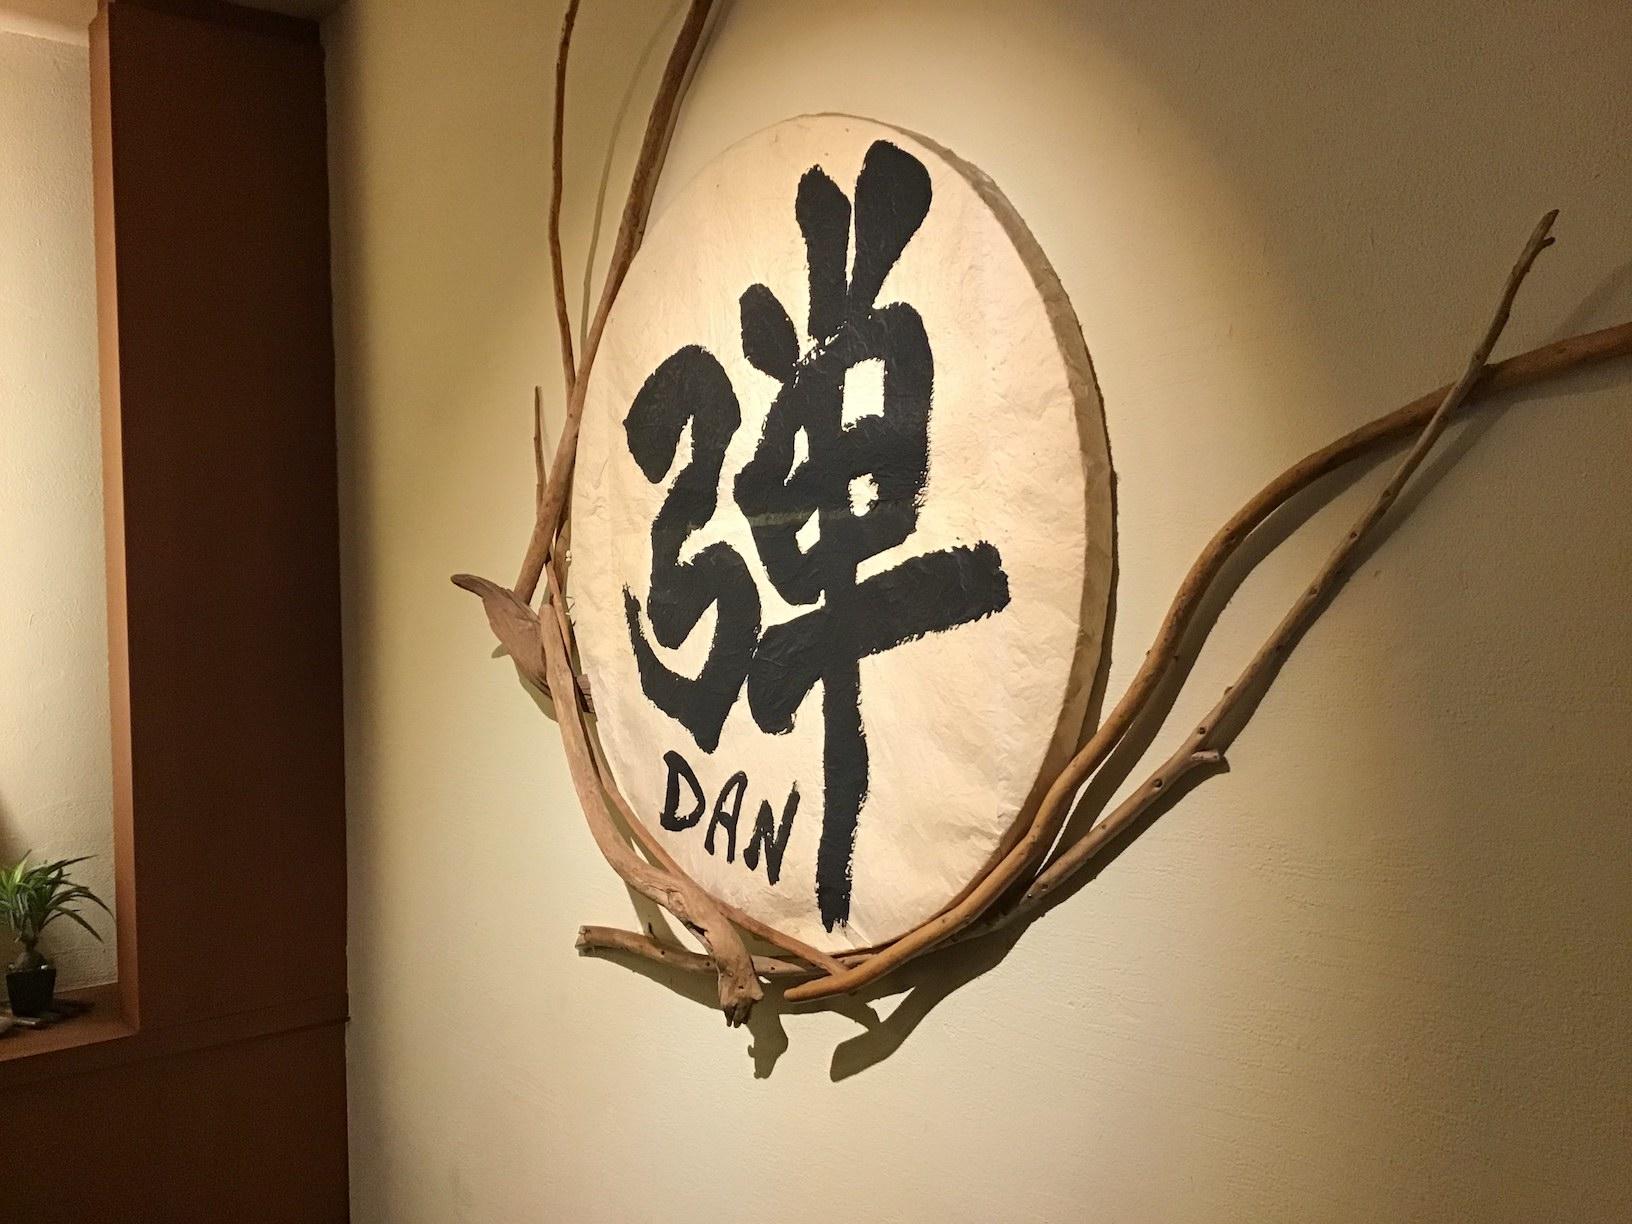 21期生松波さんの麺工房弾@岐阜市福光東1-24-21、5月18日新装開店!